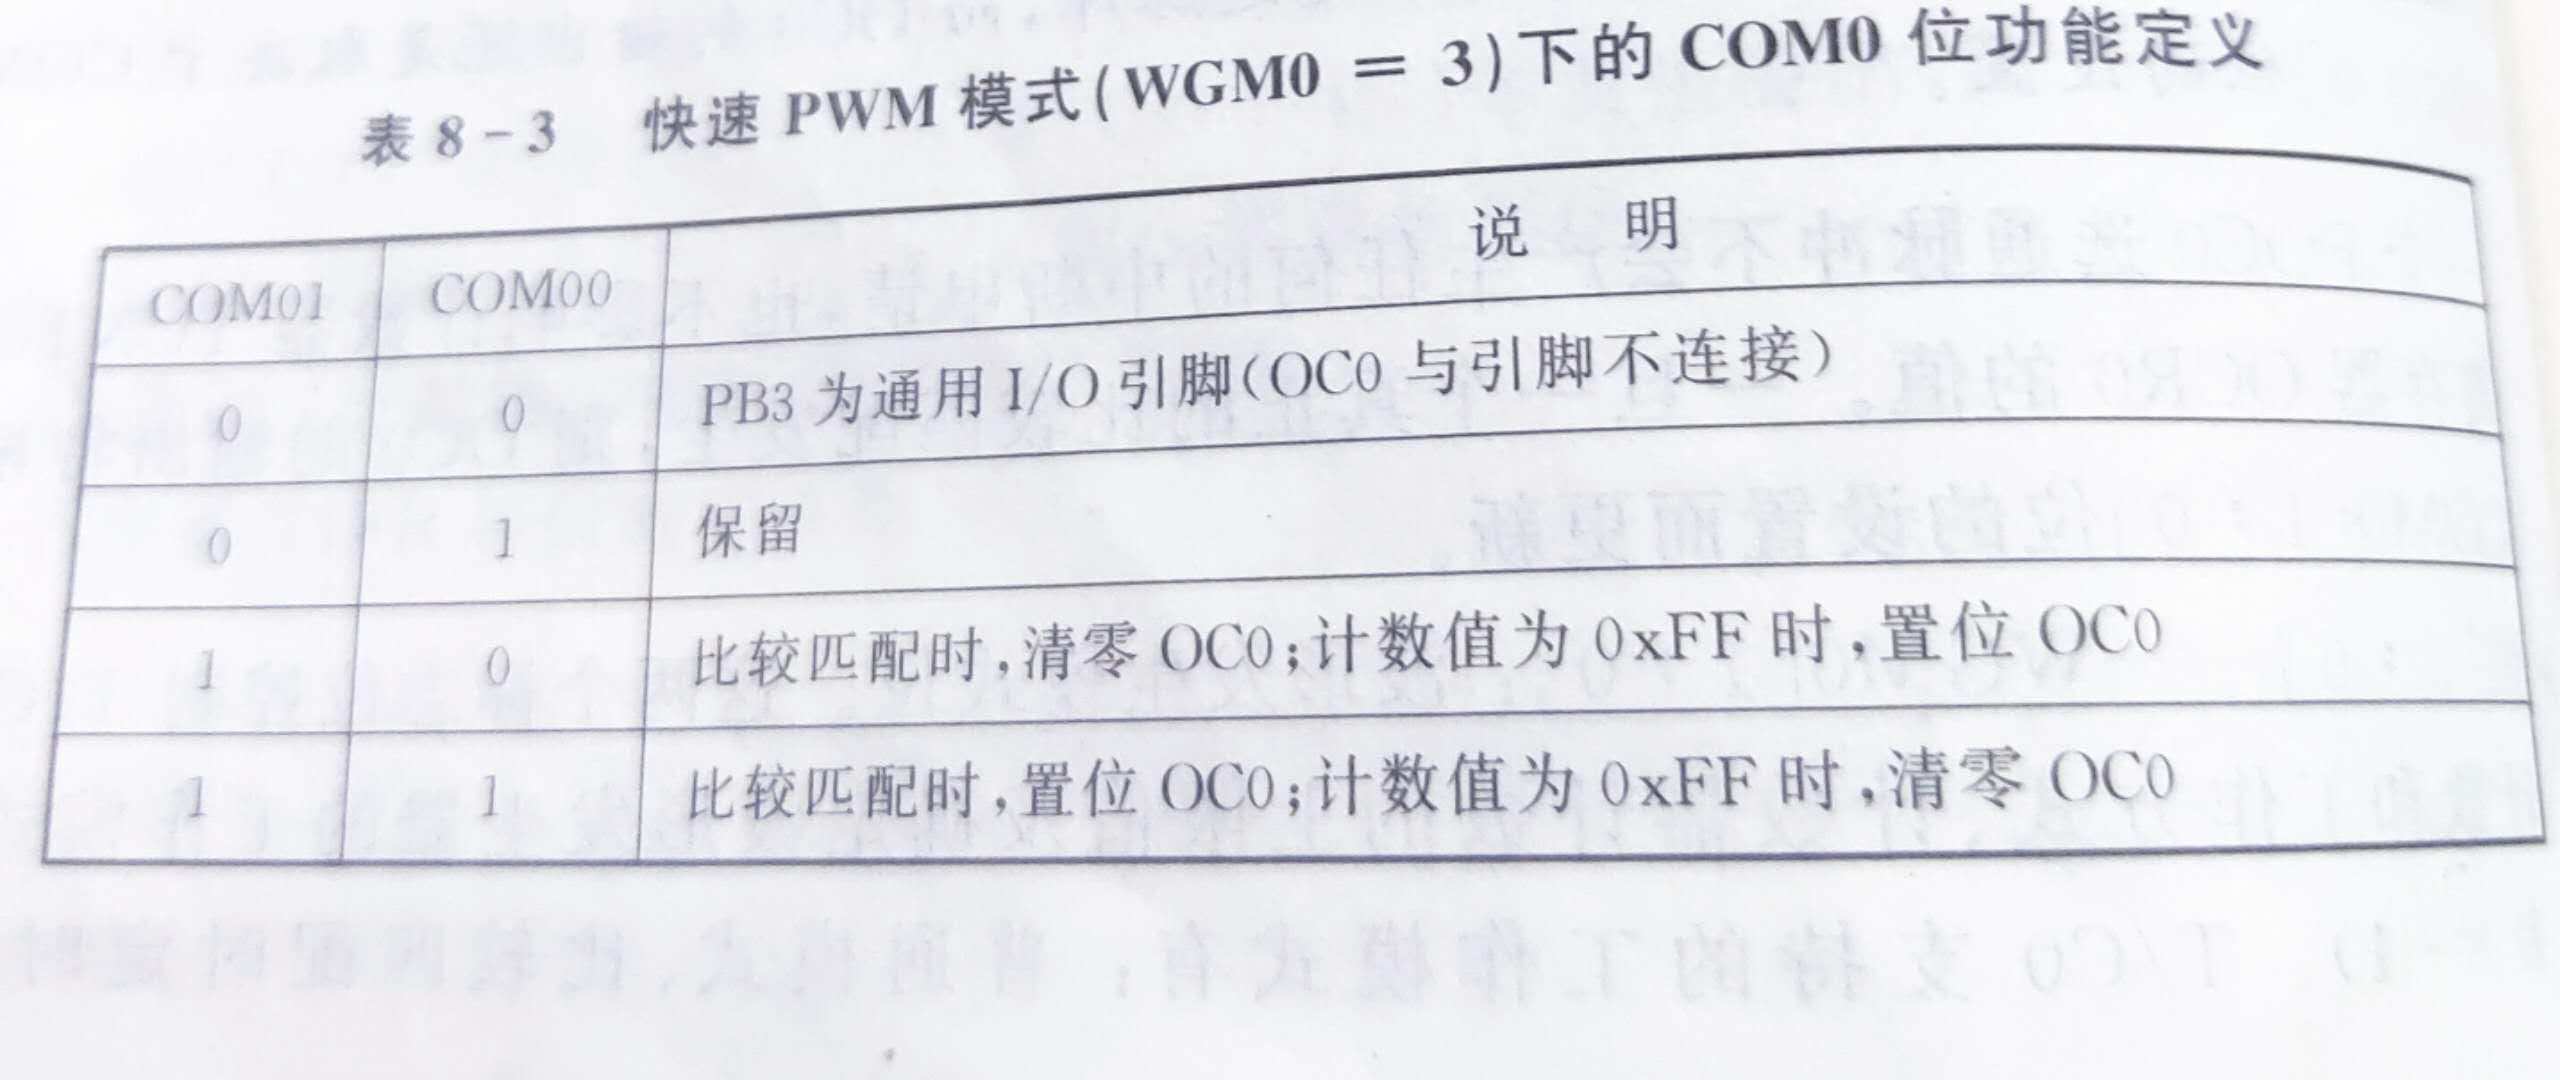 PWM5.jpg